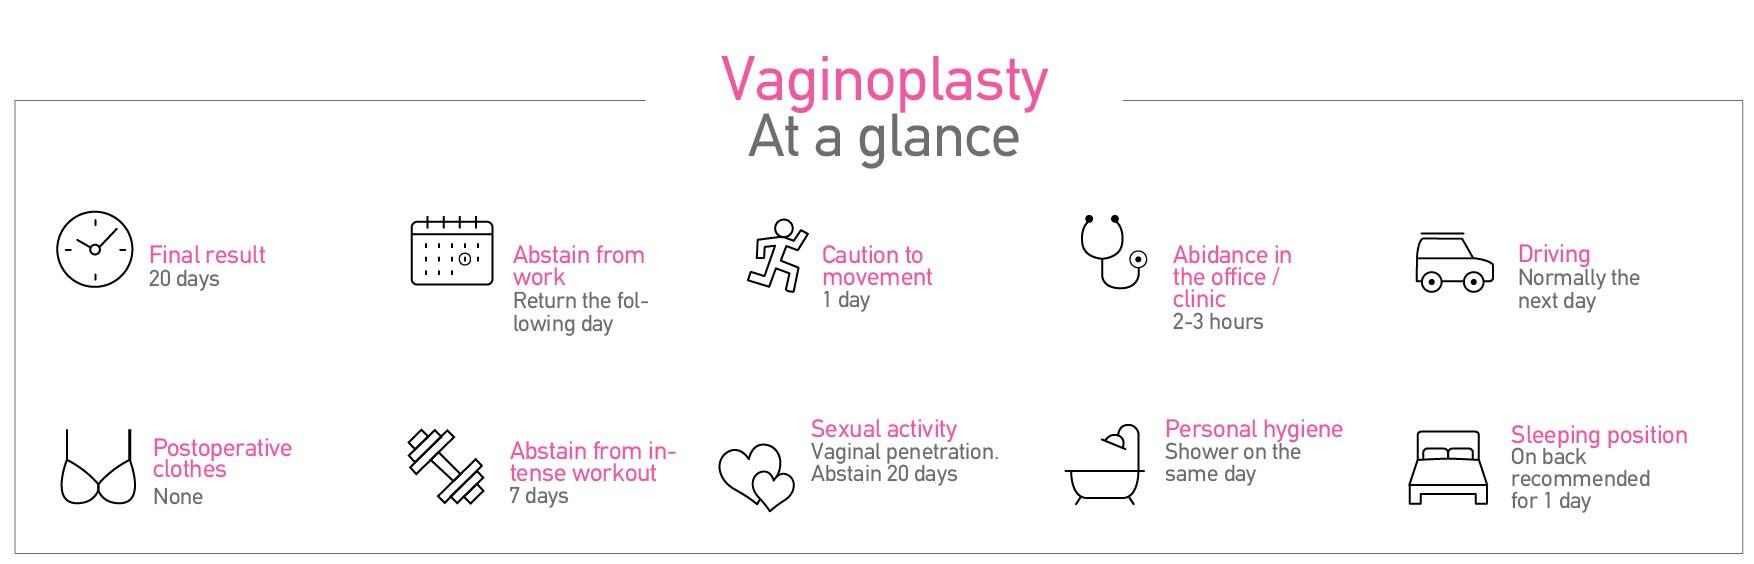 Vaginoplasty